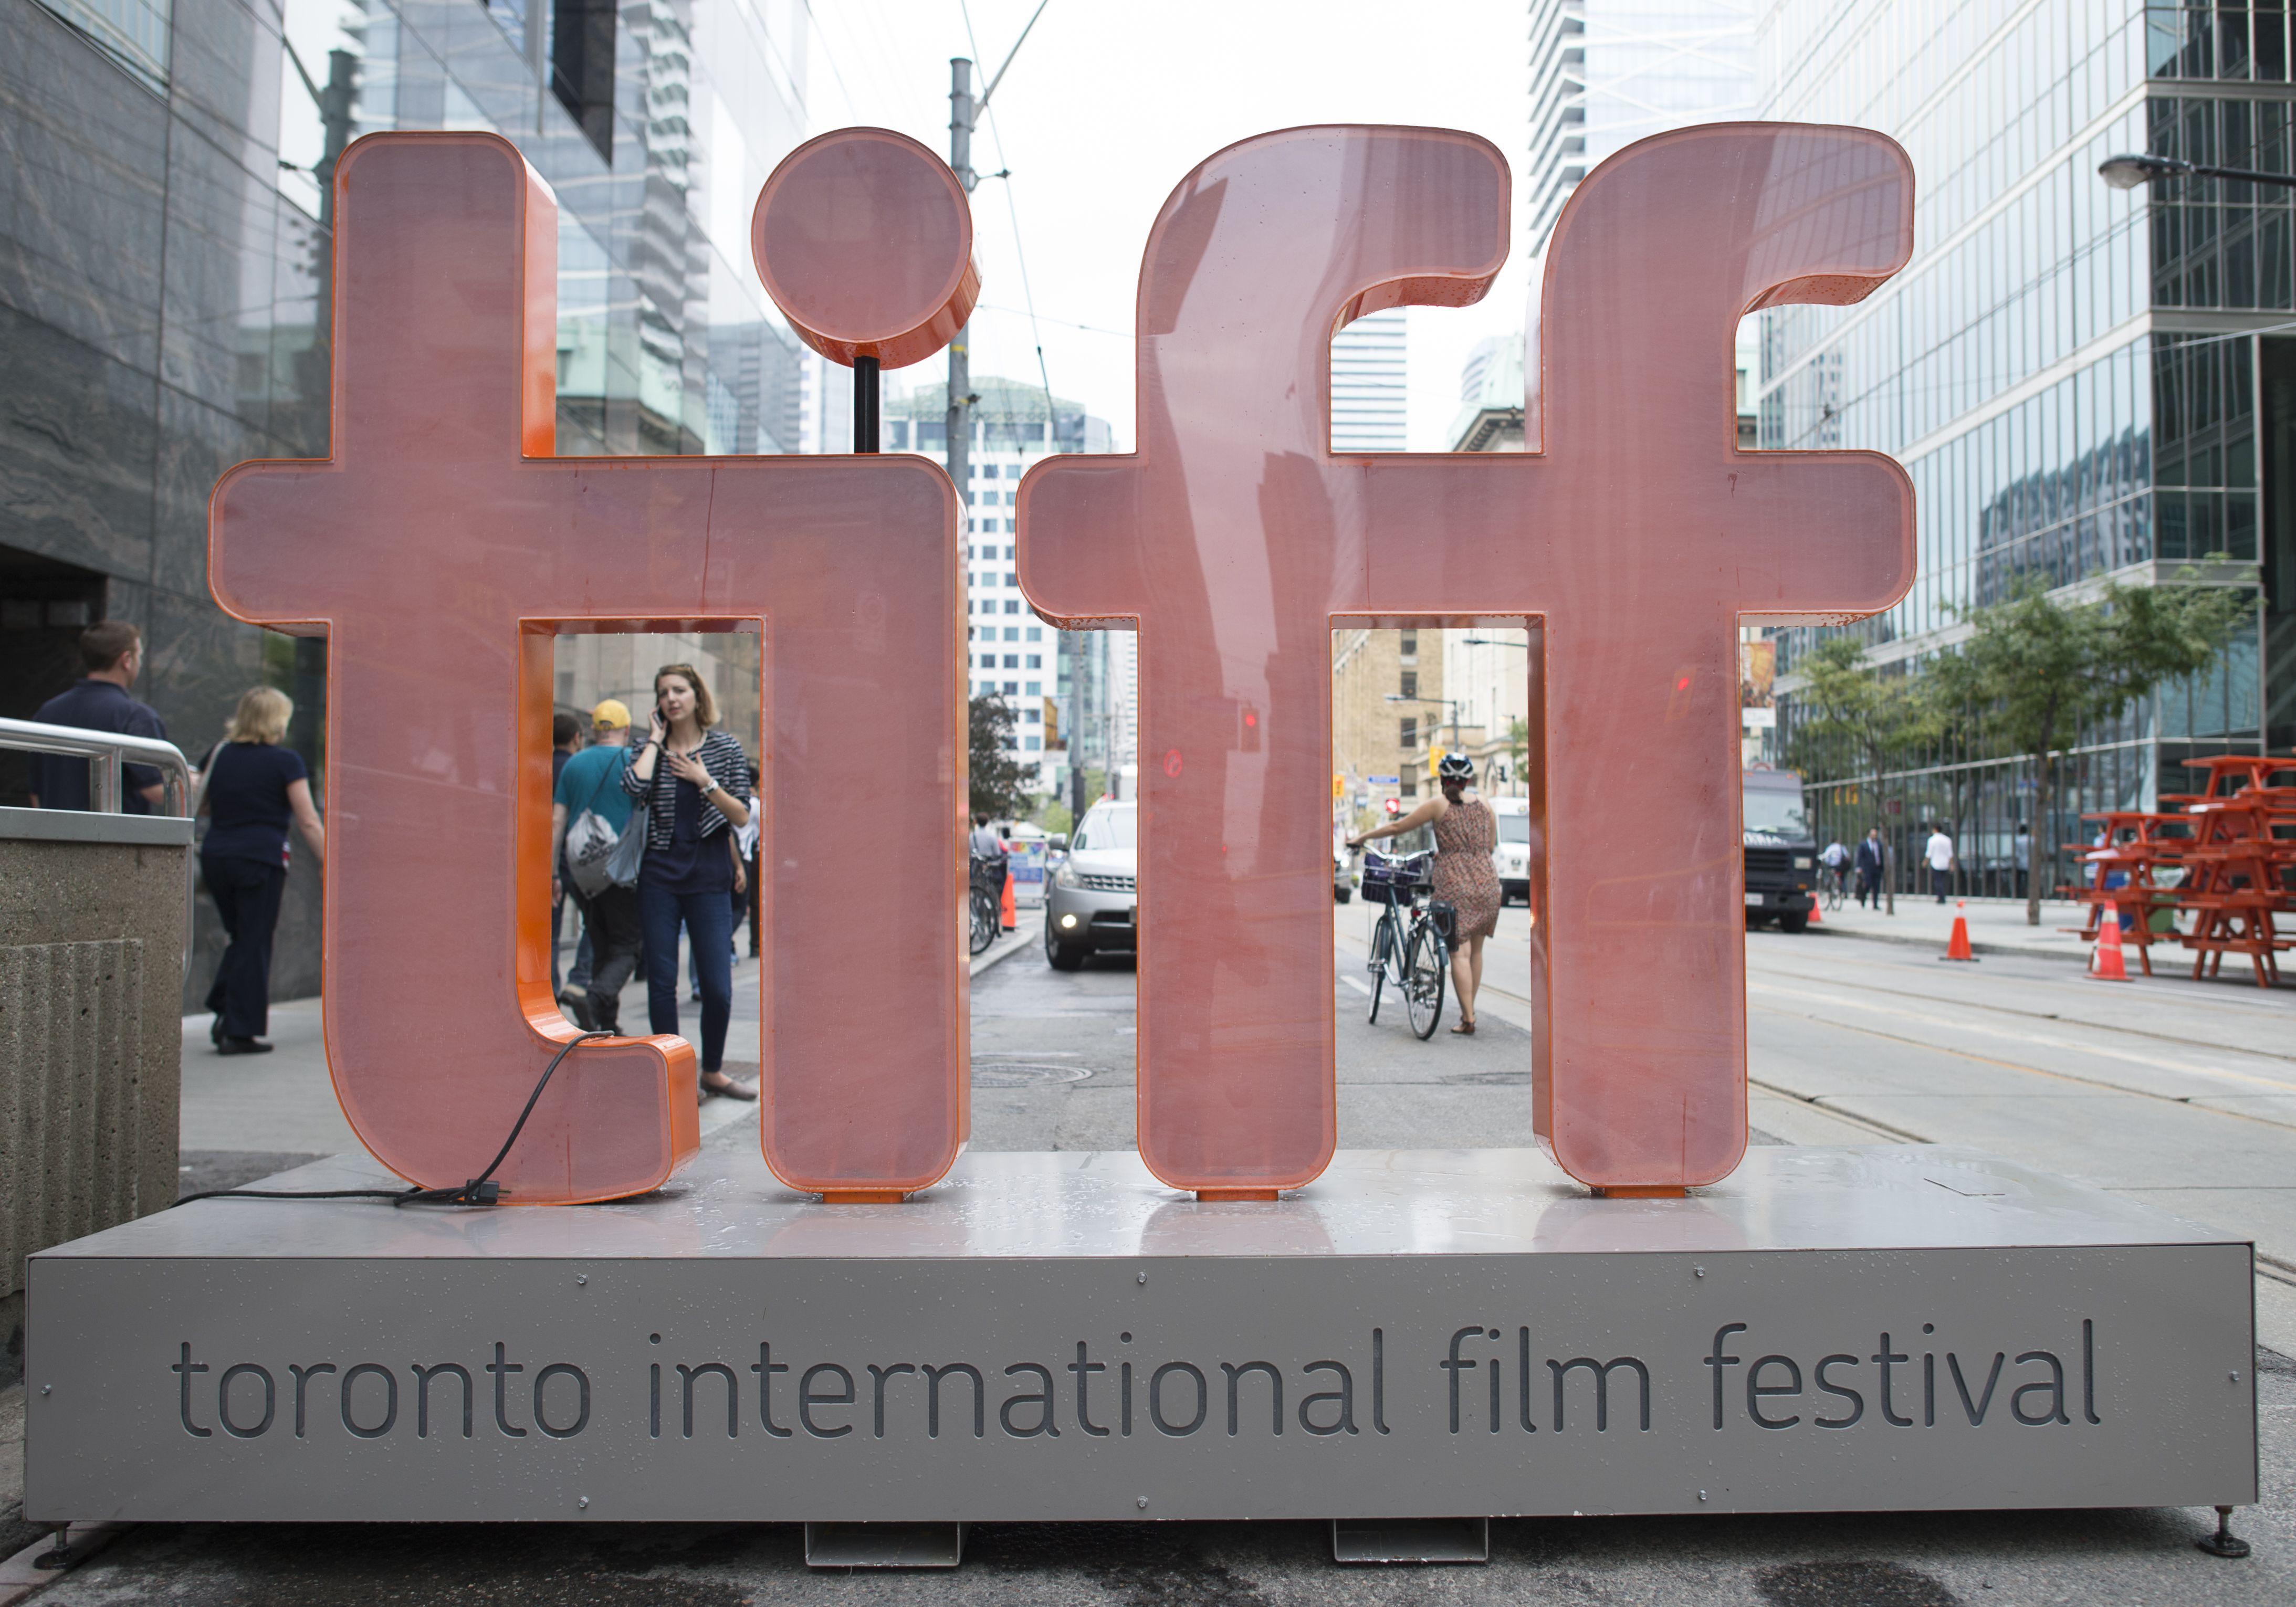 TIFF 2019 Announces Platform Jury, Breaks Tradition of Filmmaker-Heavy Judges Lineup